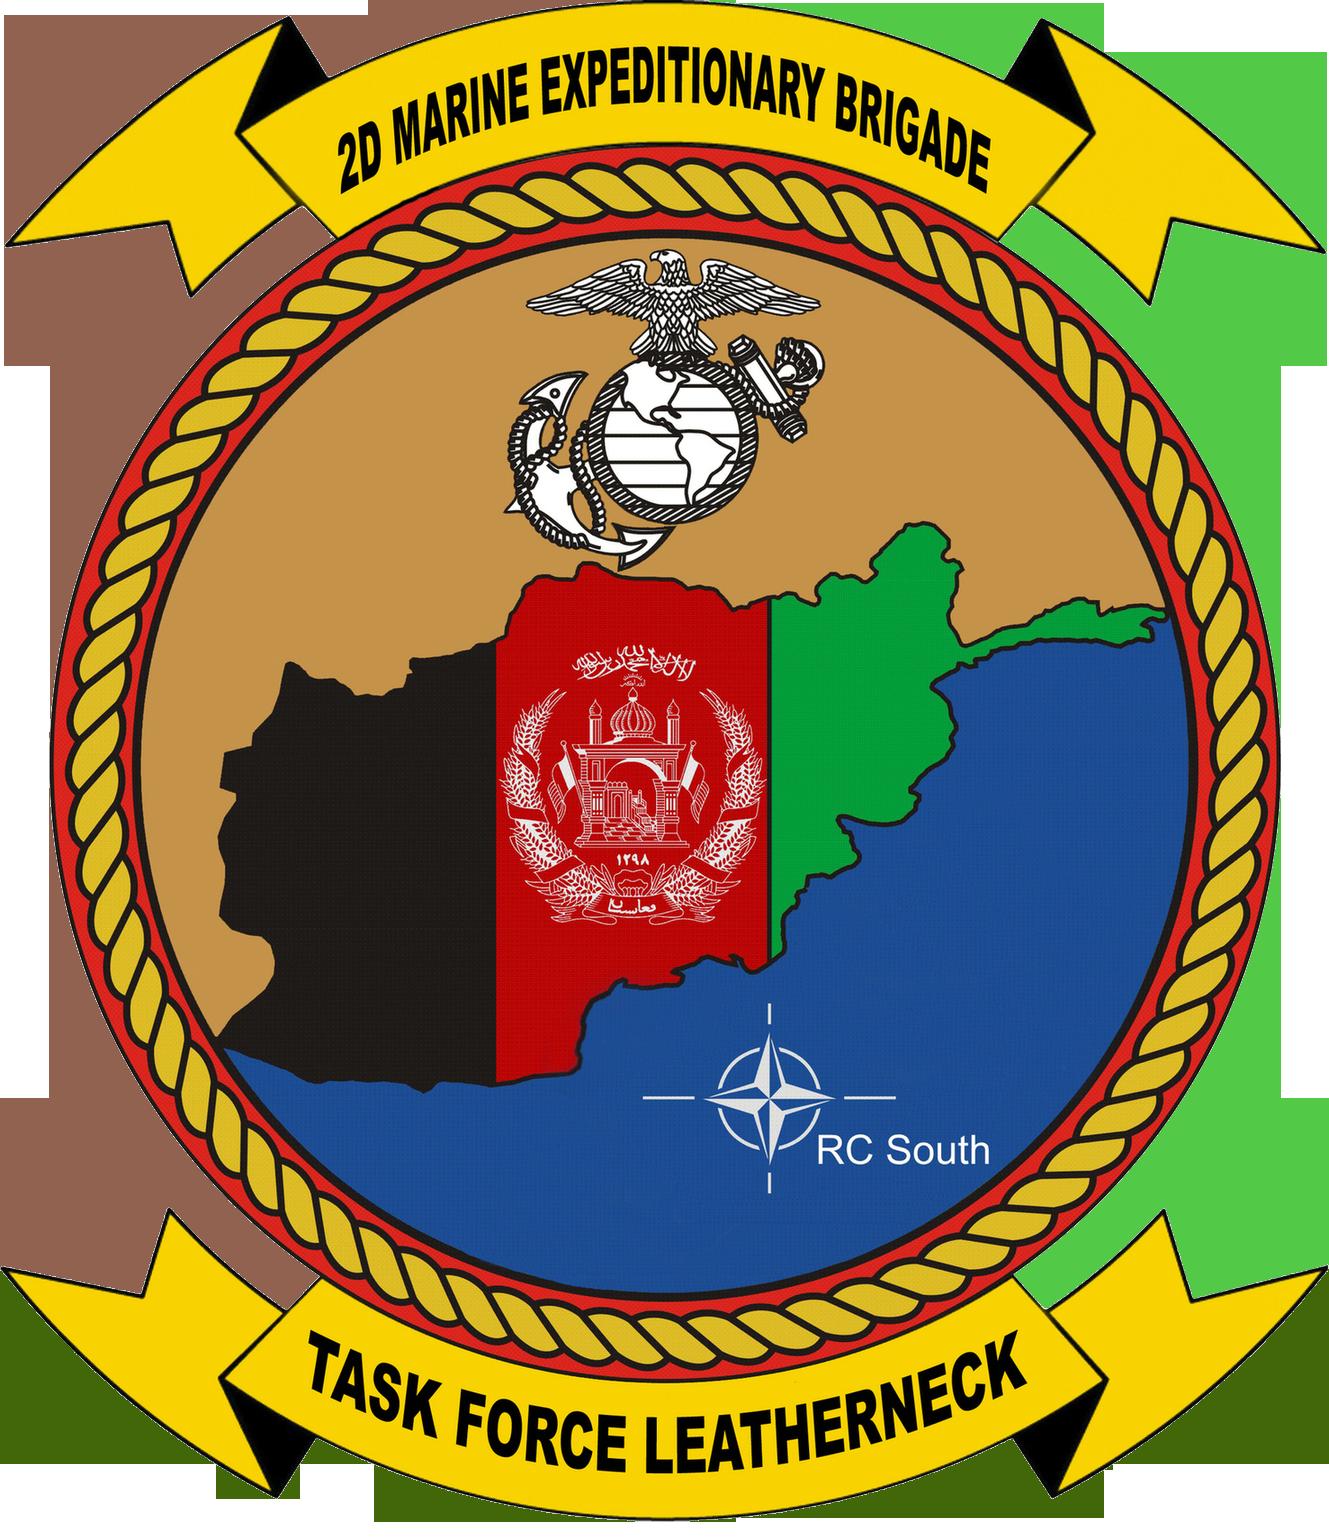 Task Force Leatherneck - Wikipedia